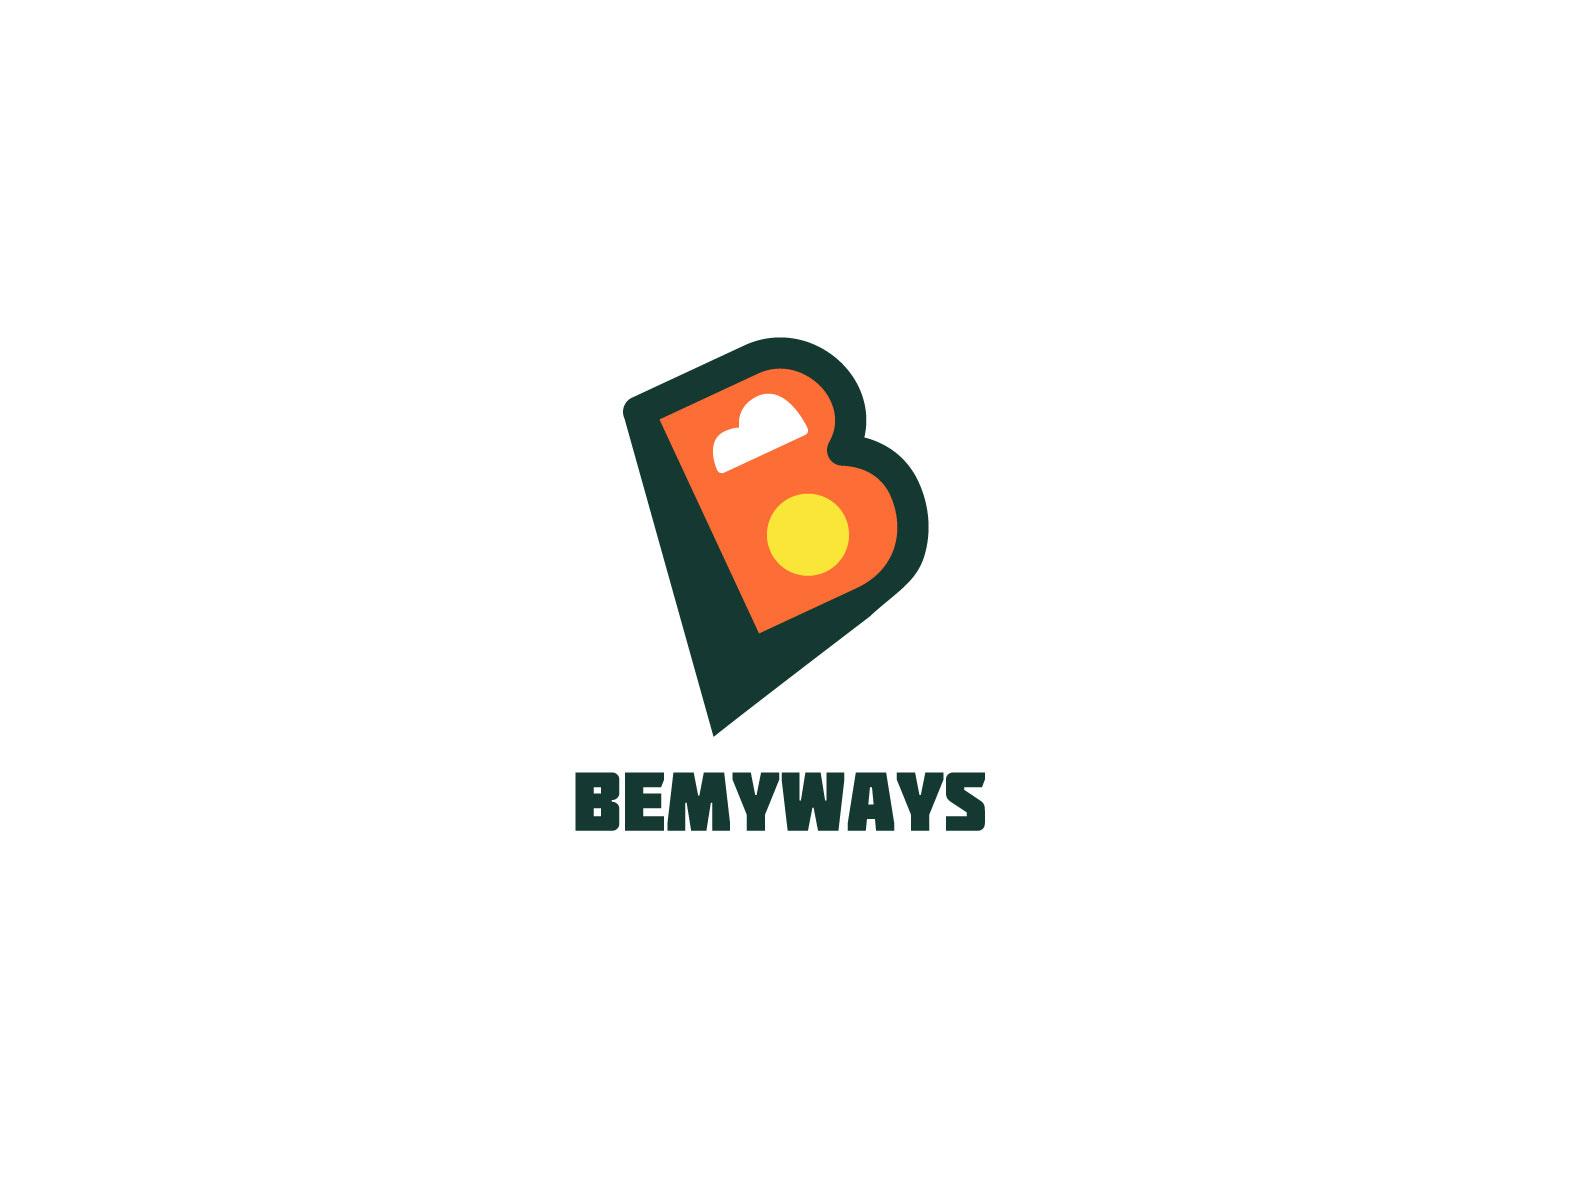 Разработка логотипа и иконки для Travel Video Platform фото f_4905c37e2fdae8e5.jpg